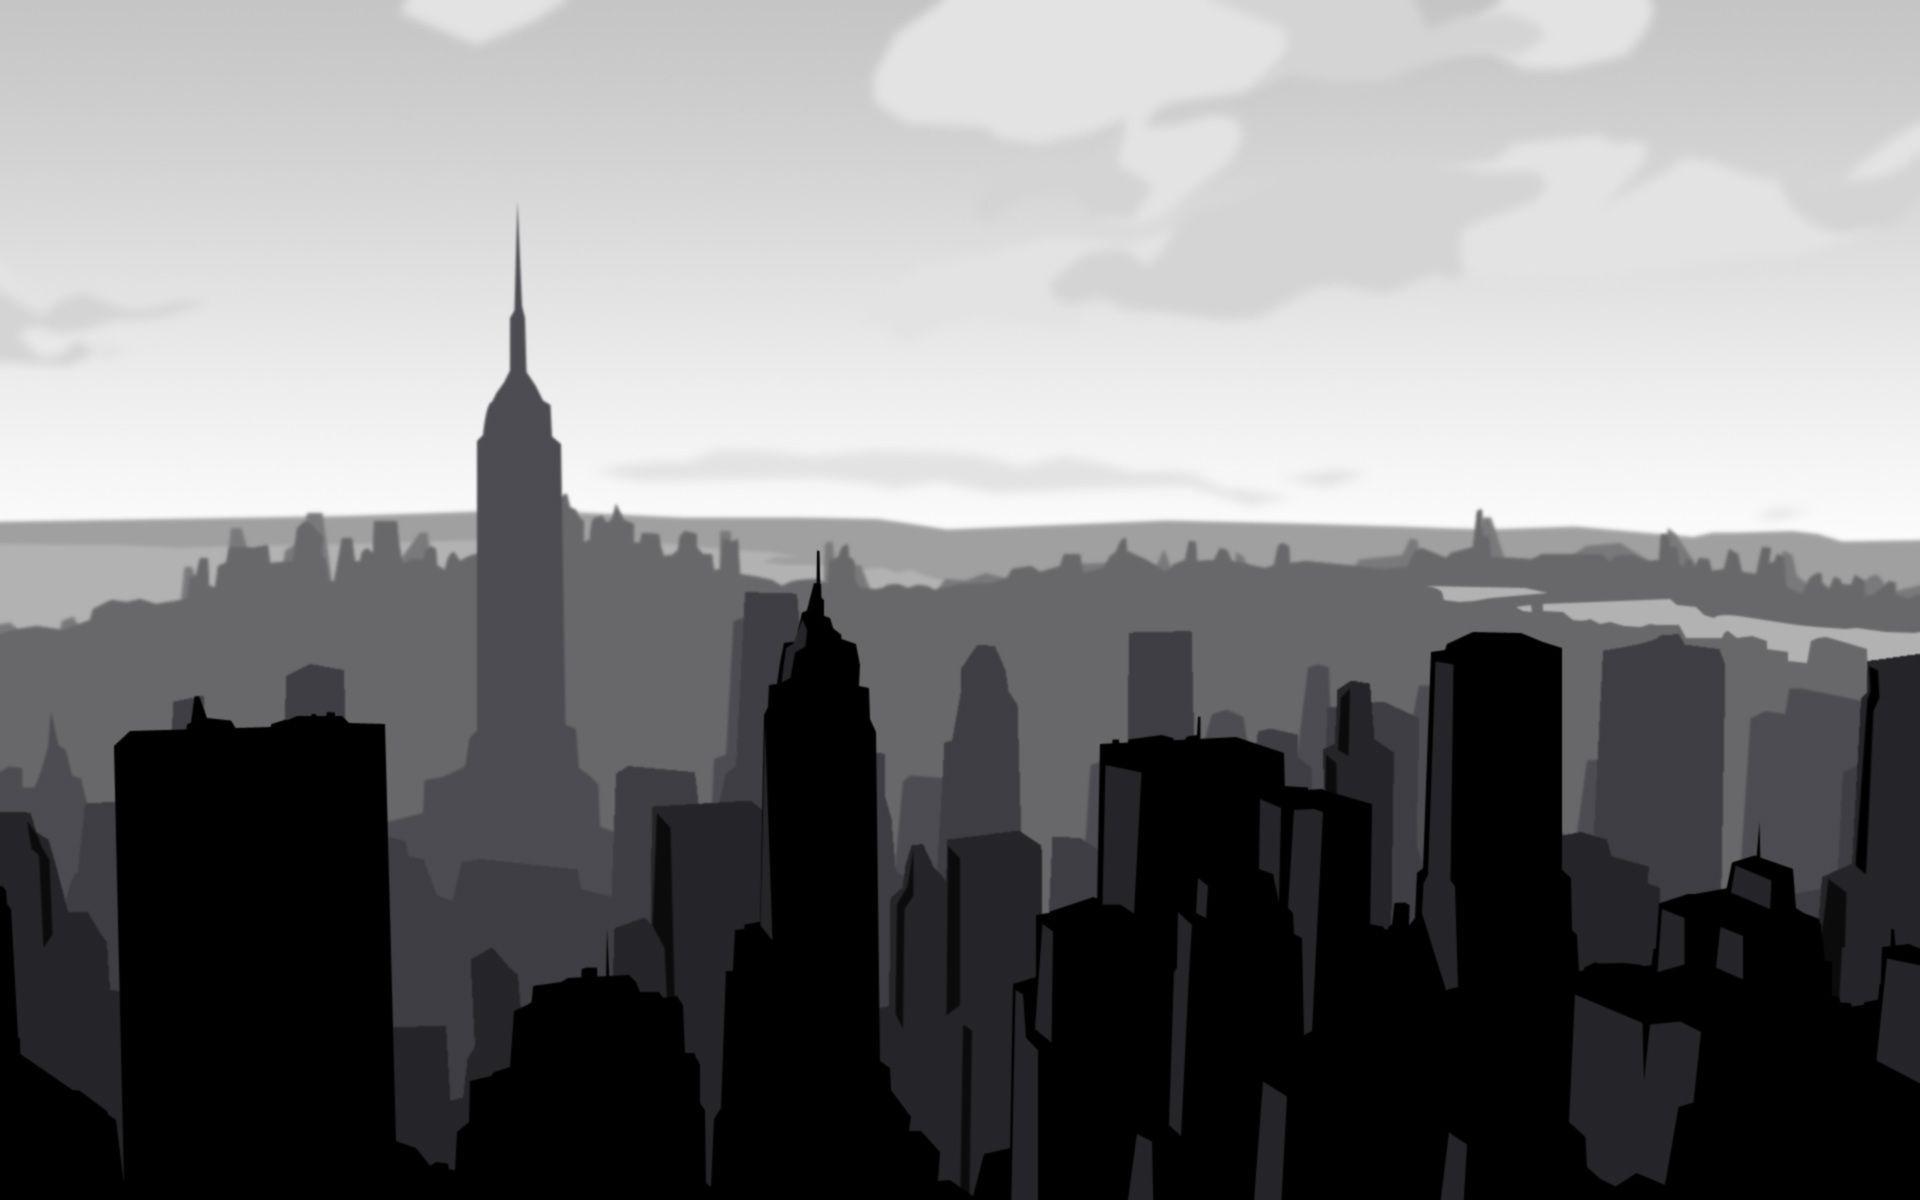 New York City Skyline Hd Wallpaper Vector Desktop Wallpaper City Skyline Skyline Cityscape